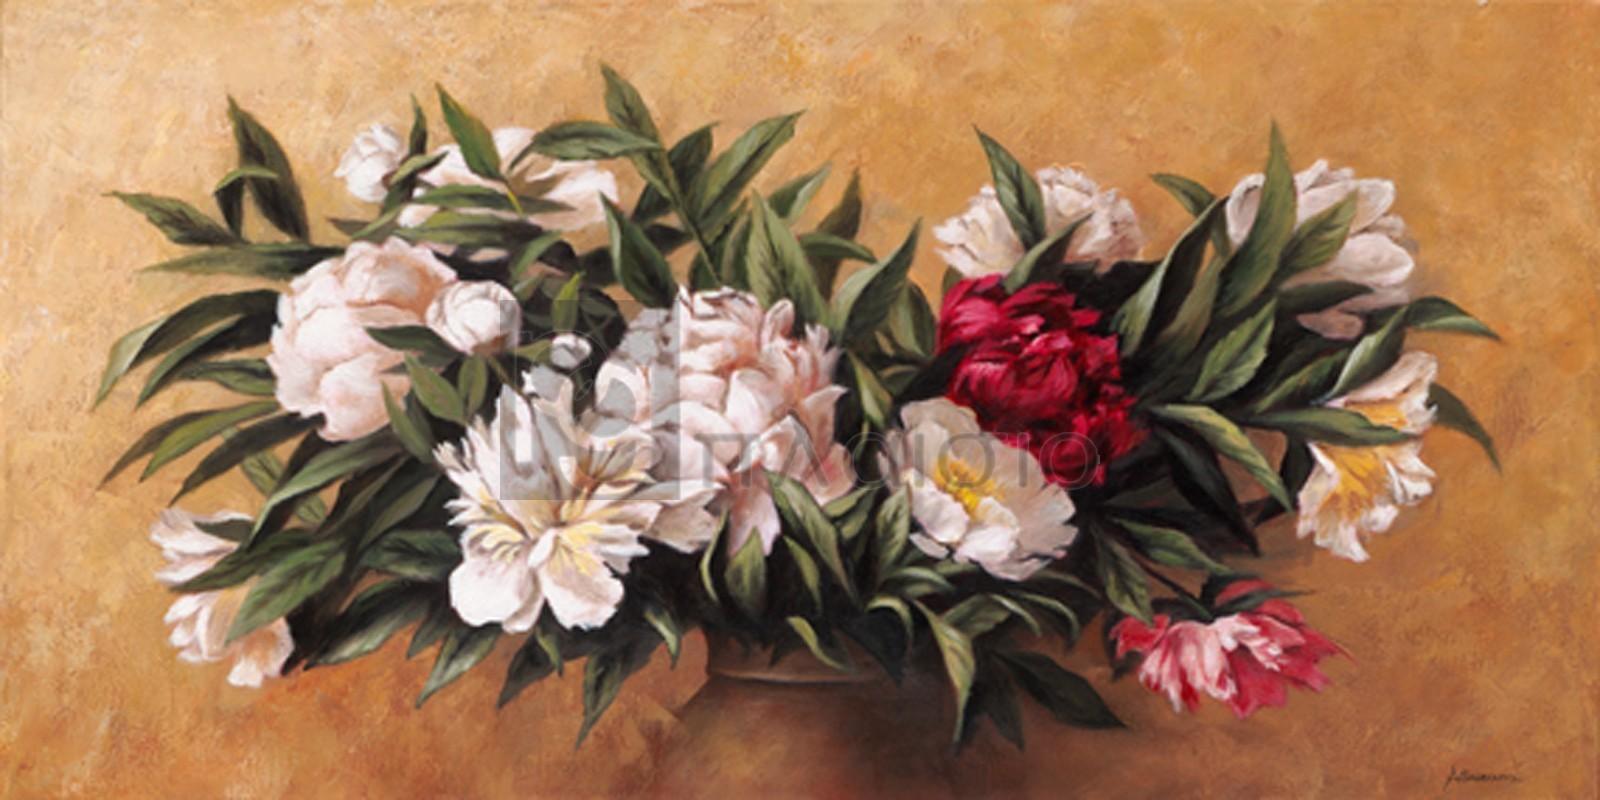 A.Susana - Λευκές και κόκκινες παιόνιες